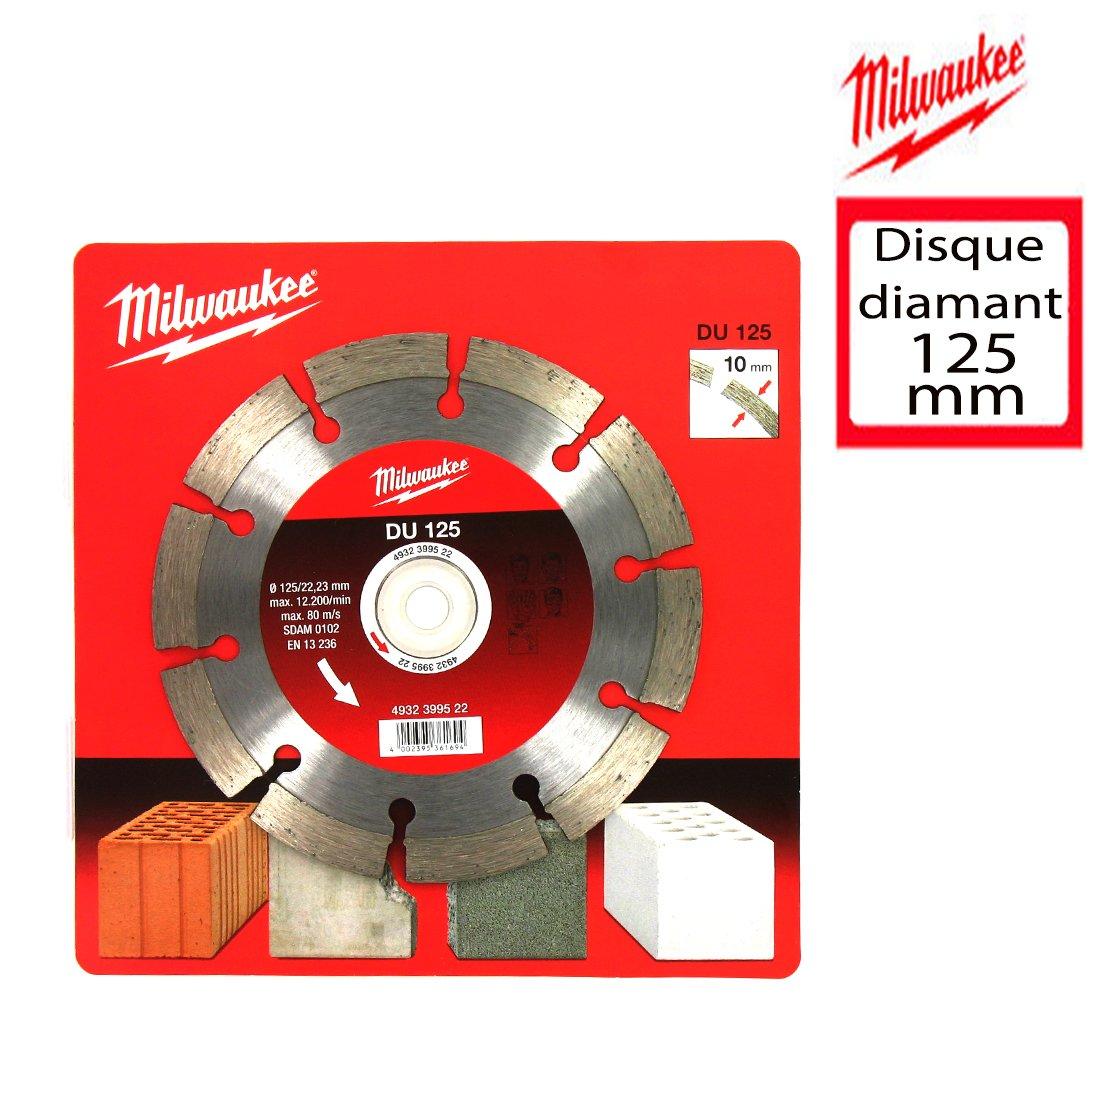 Milwaukee Disco diamamnte 125 mm 4321080-RT-XM 305U